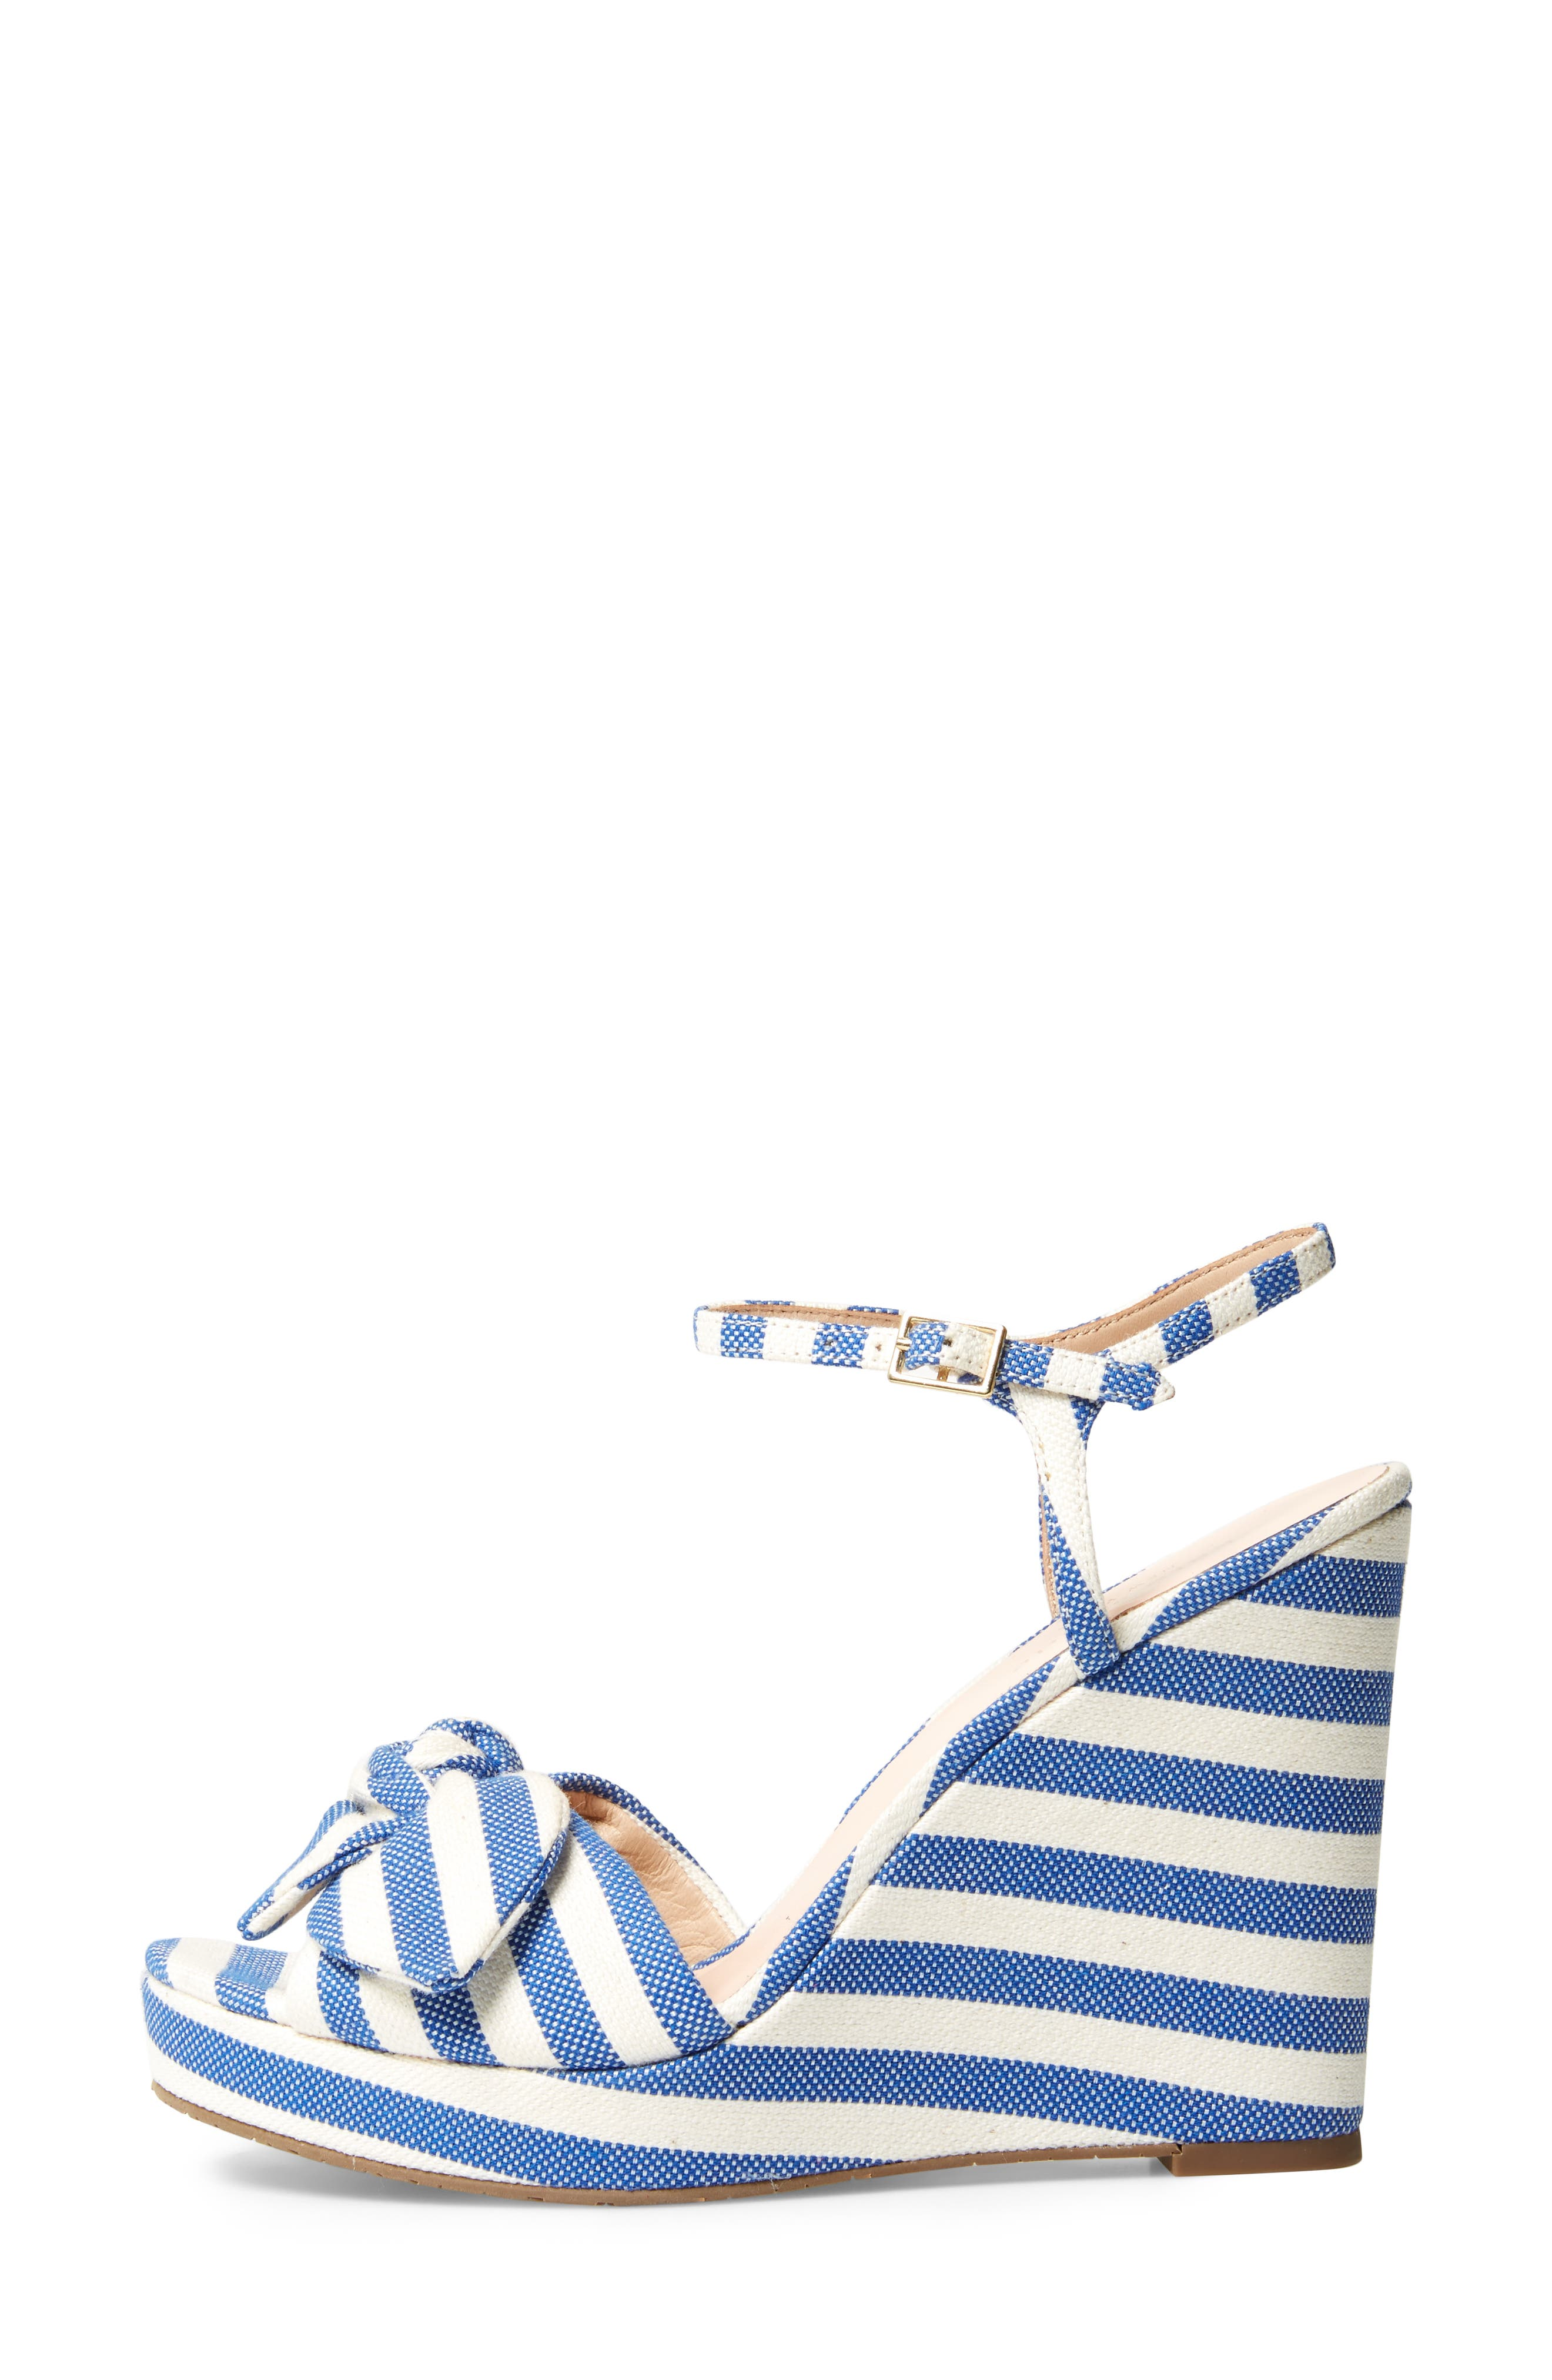 janae knot platform wedge sandal,                             Alternate thumbnail 3, color,                             Blue/Cream Stripe